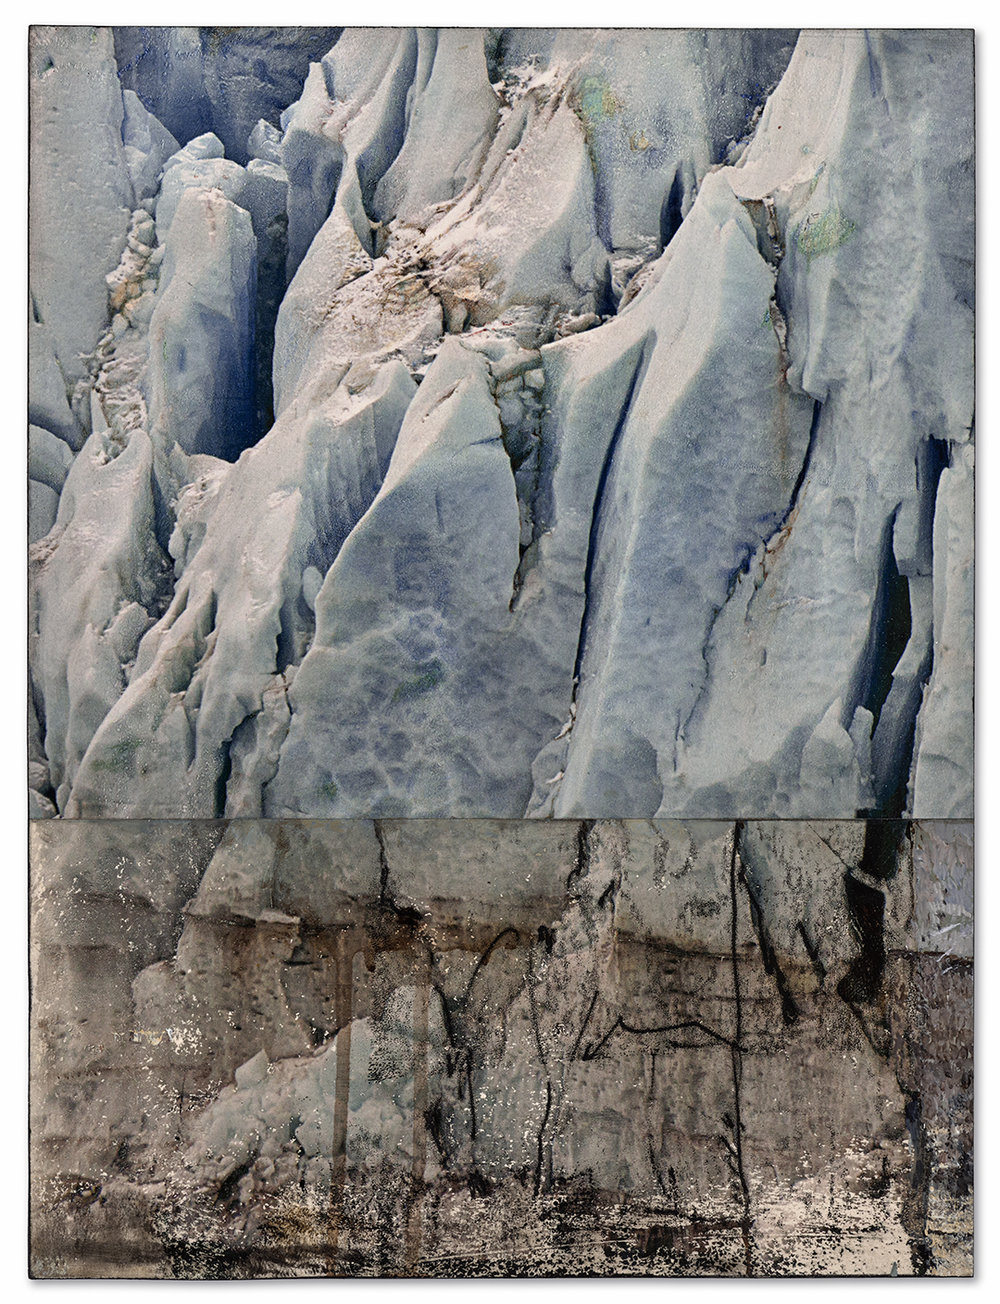 Glacier, Halved